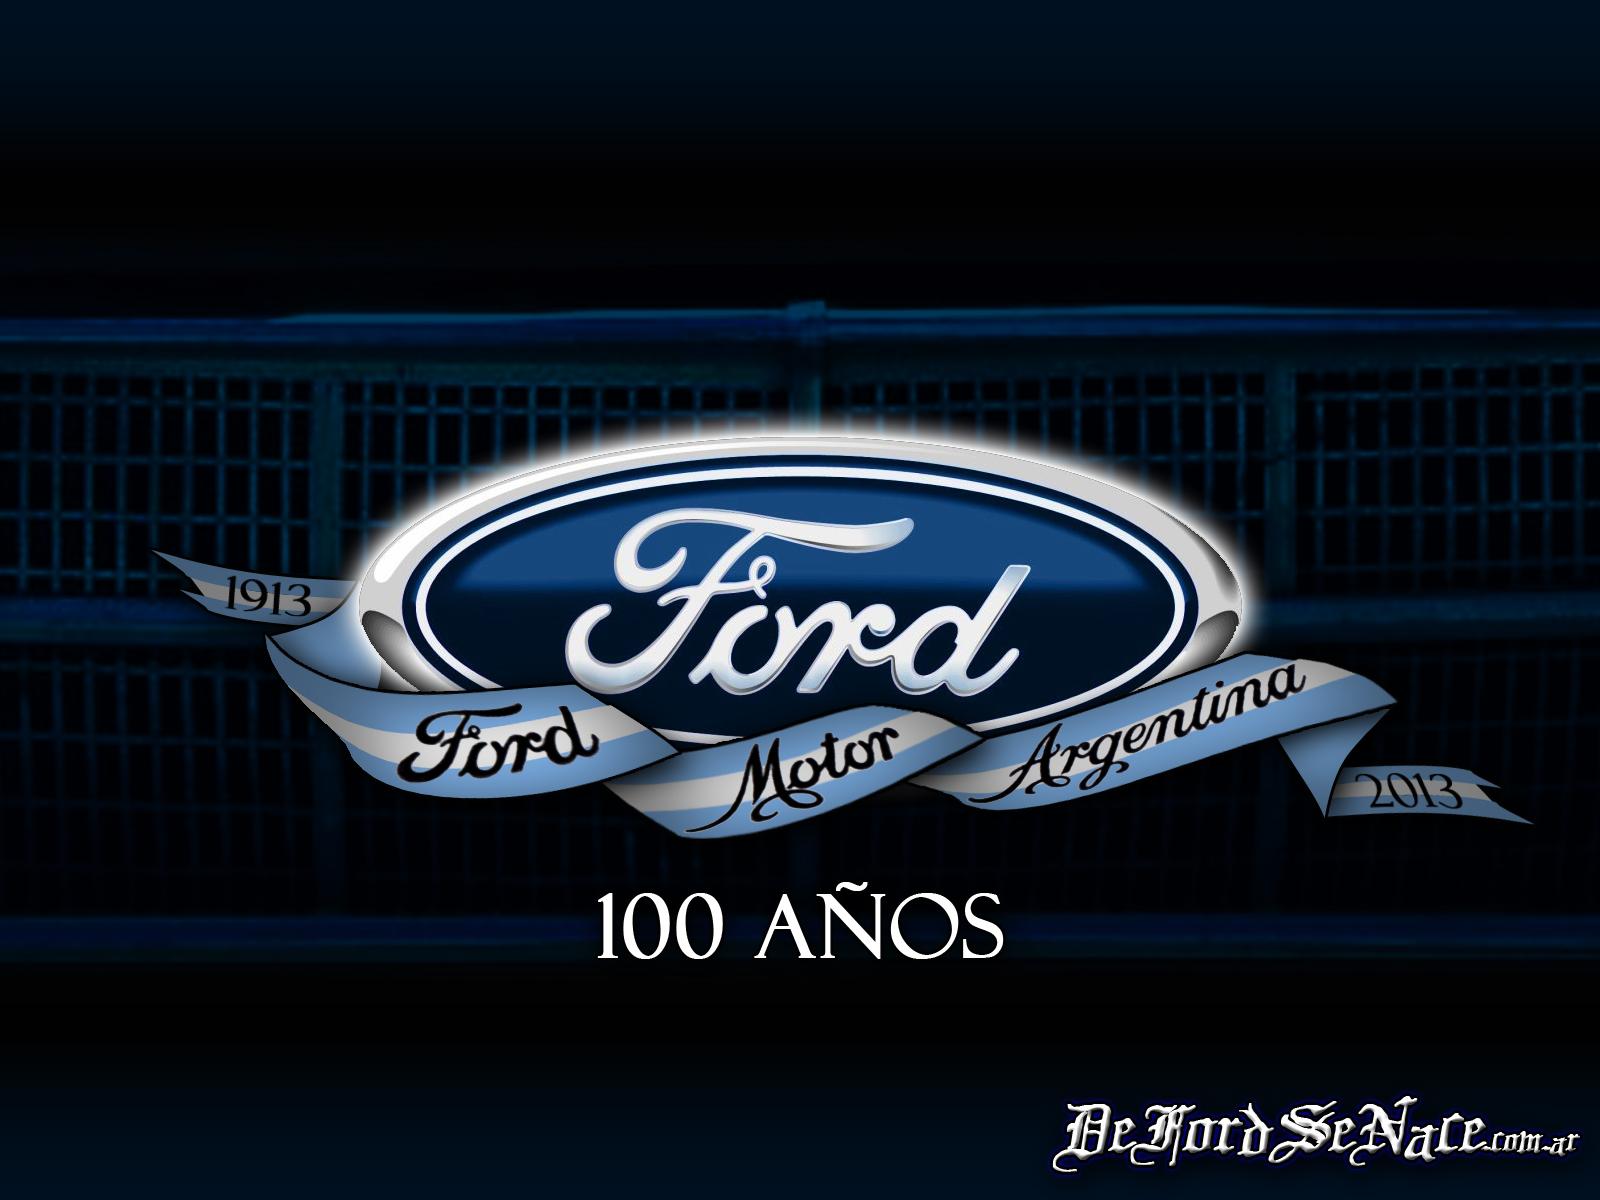 de ford se nace183